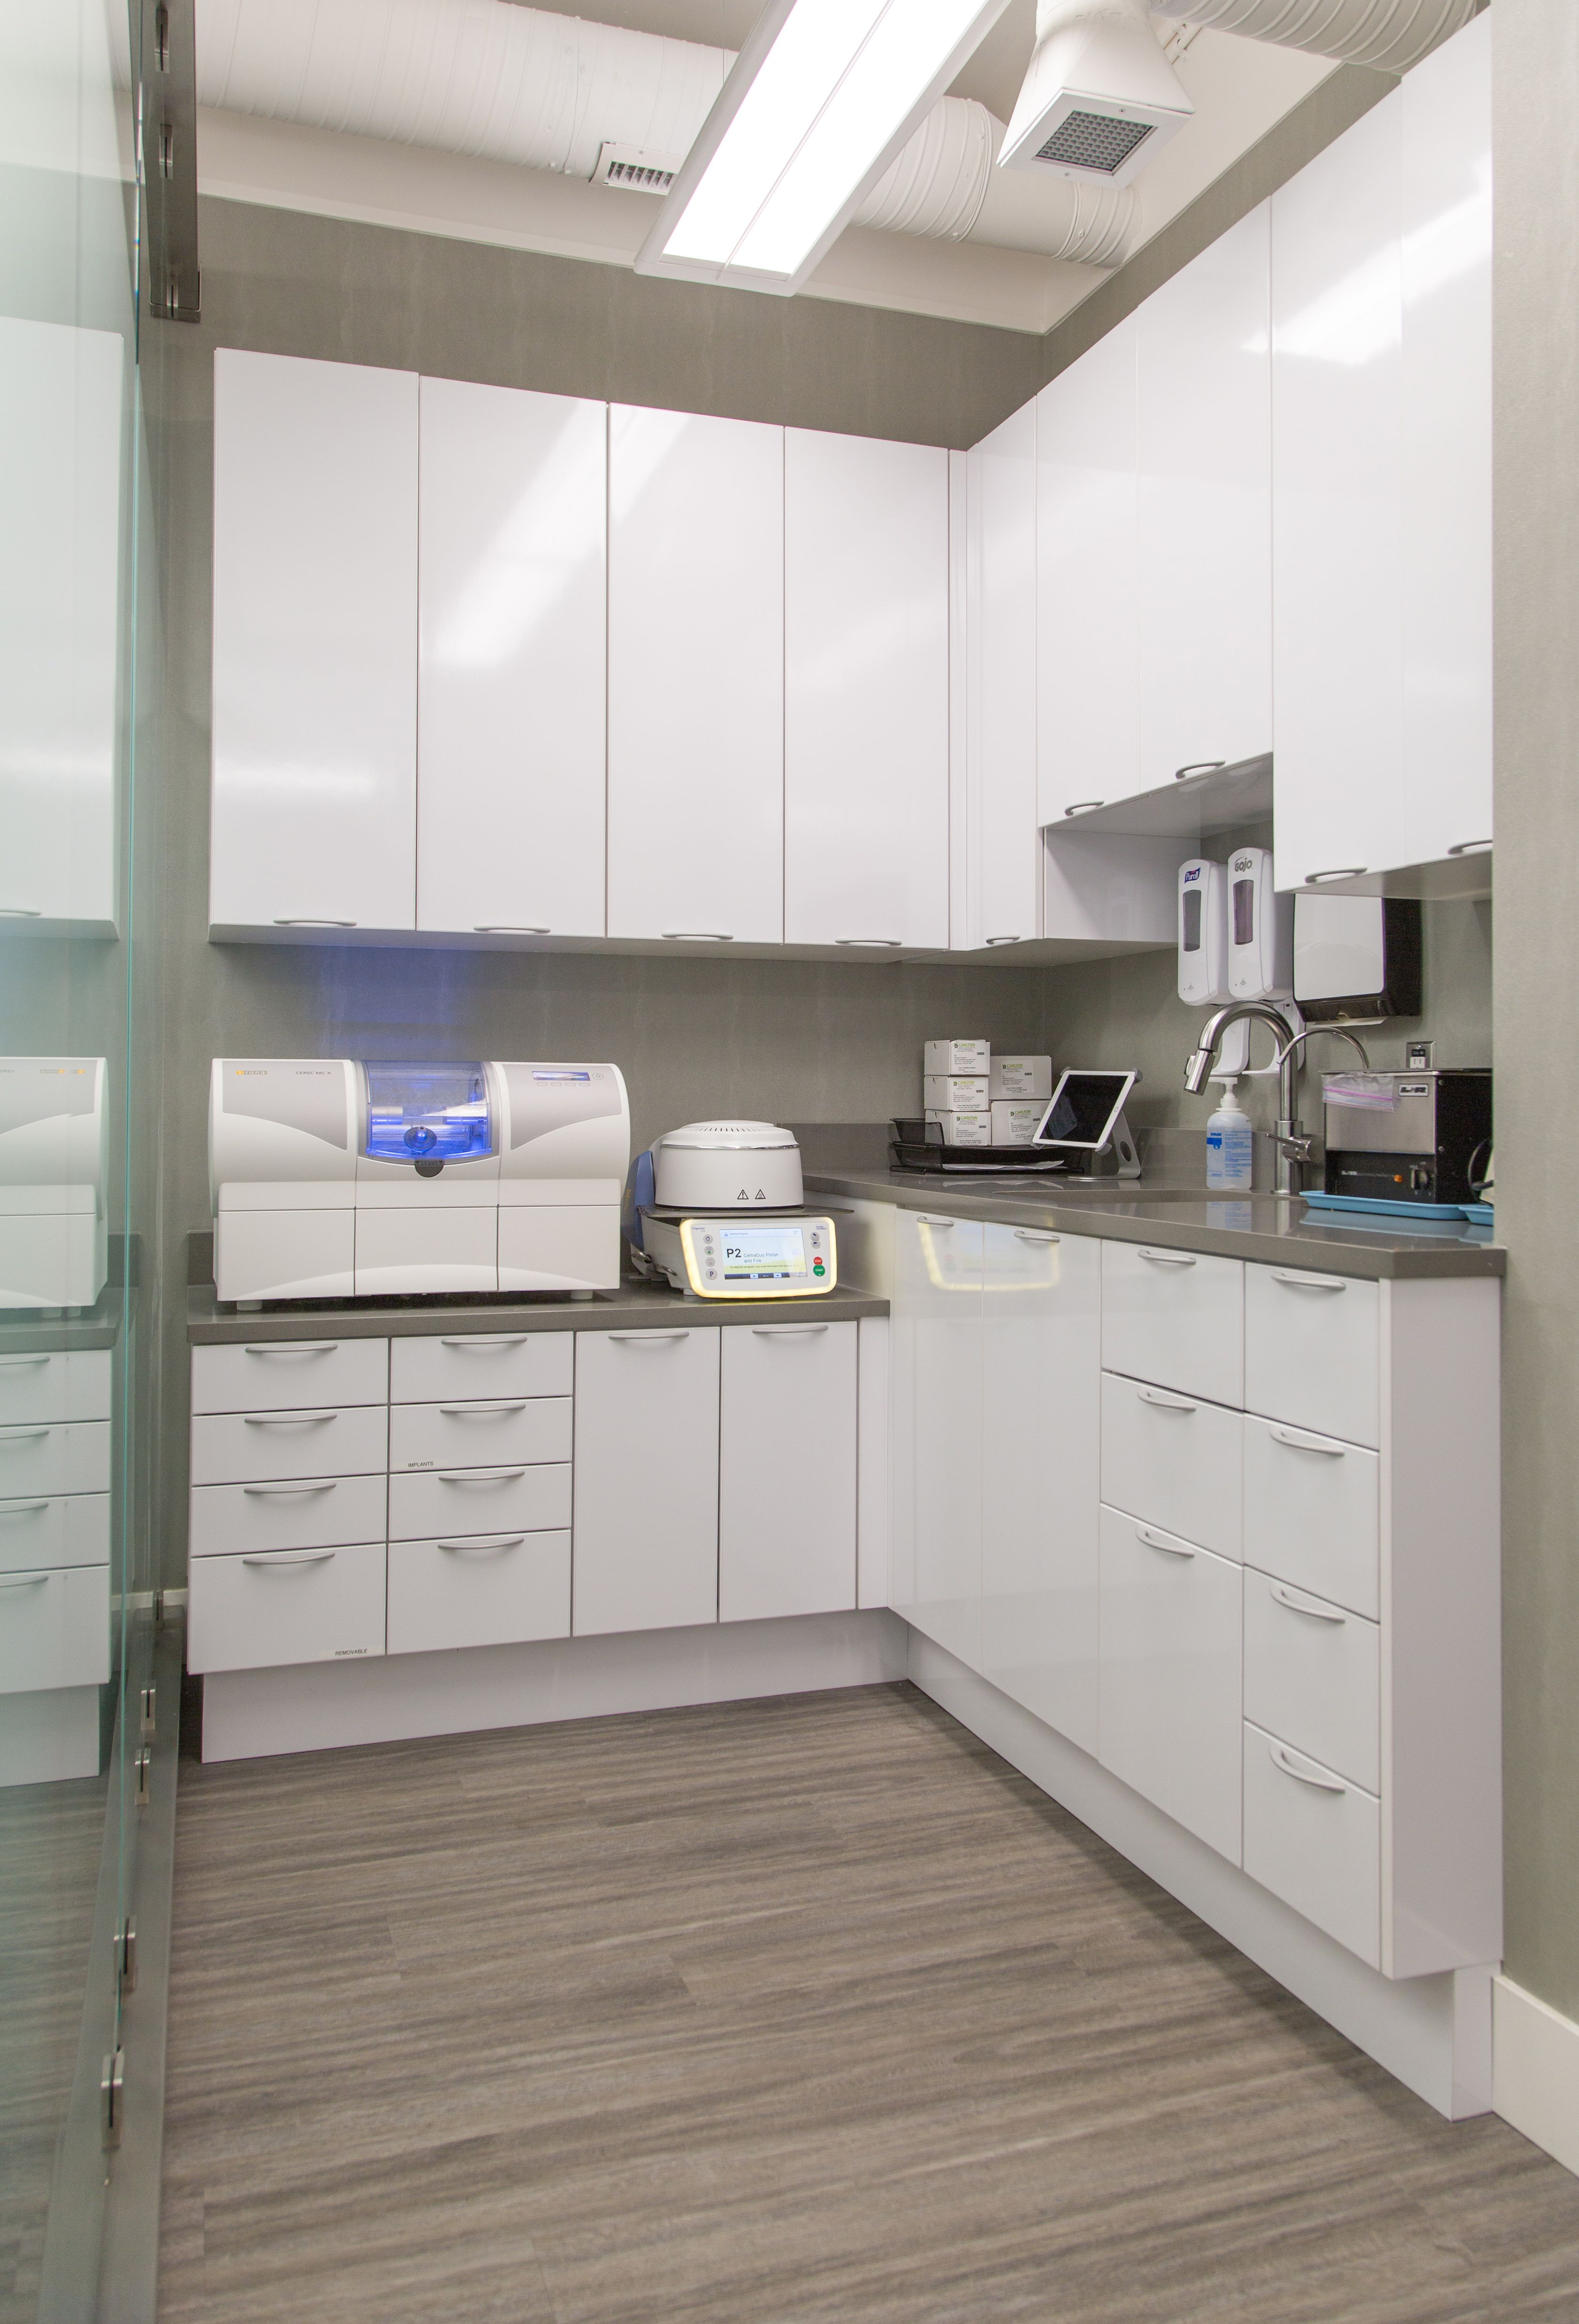 Laboratory Room Design: A-dec Inspire Dental Cabinet Sterilization Center With